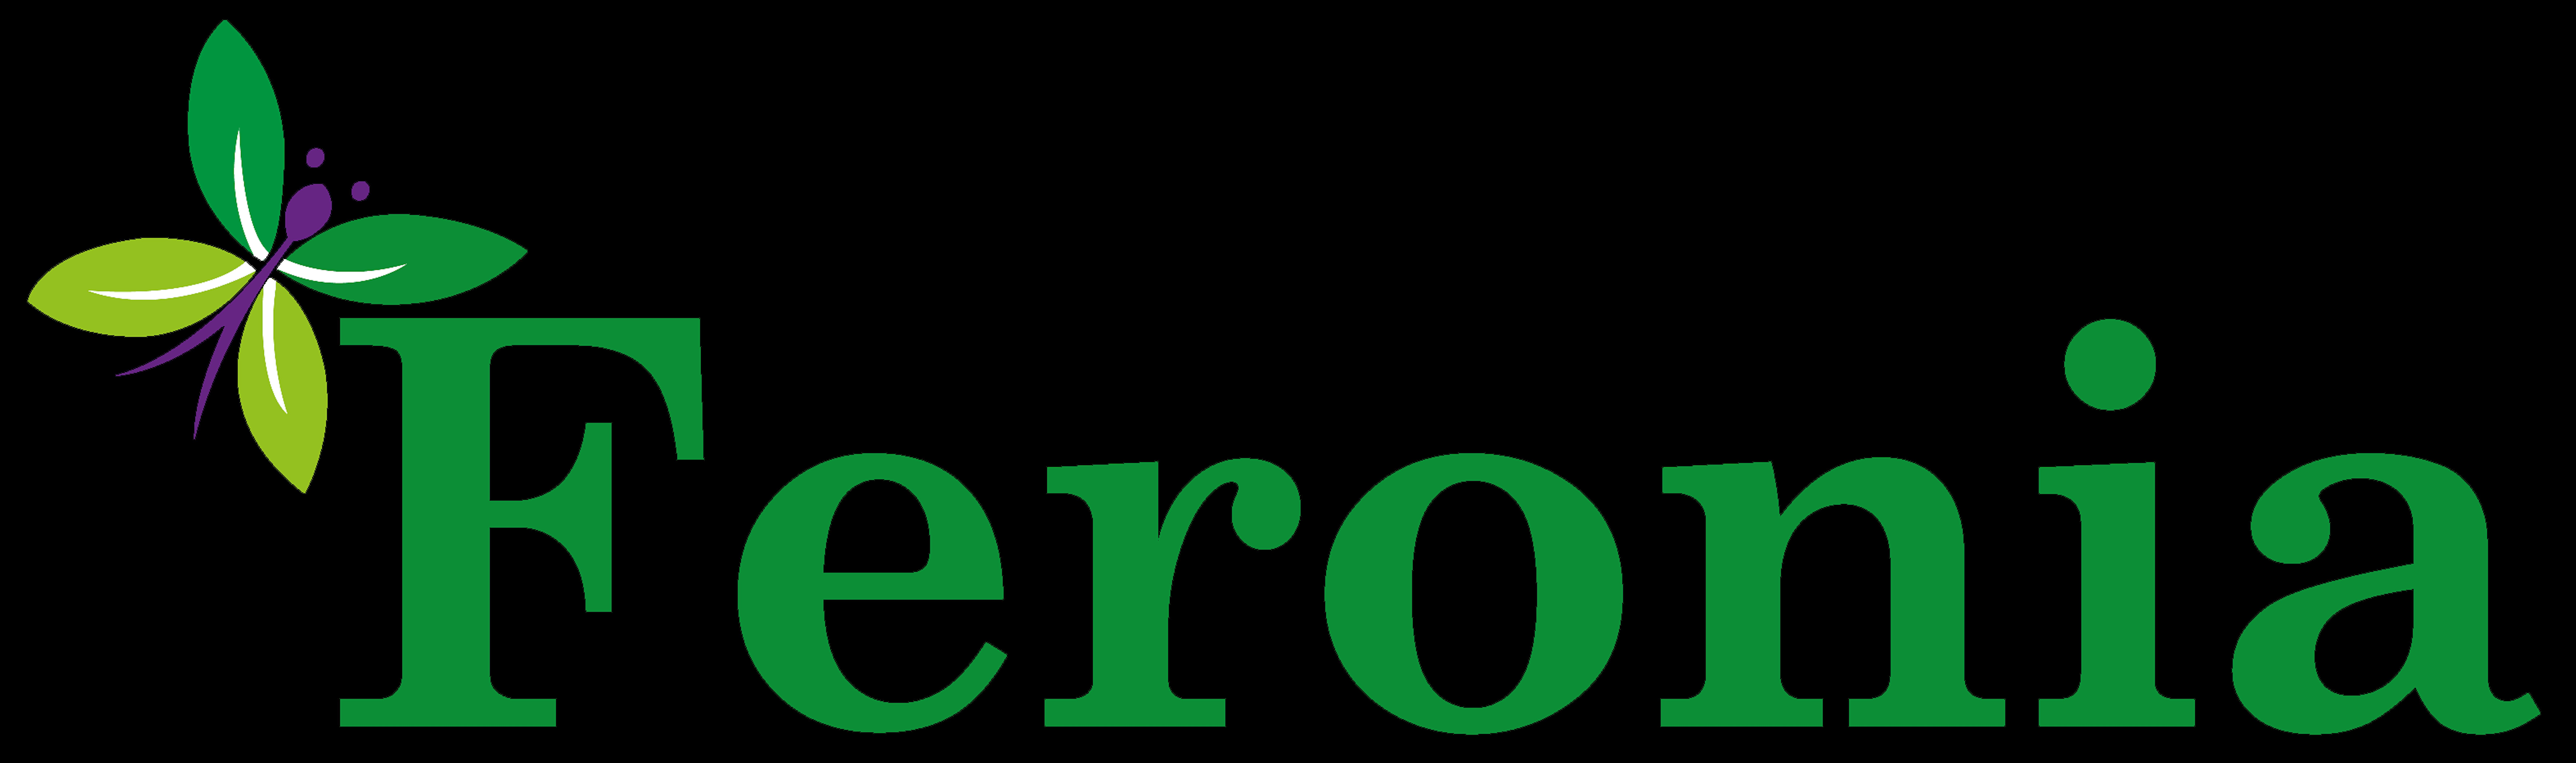 Feronia Logo